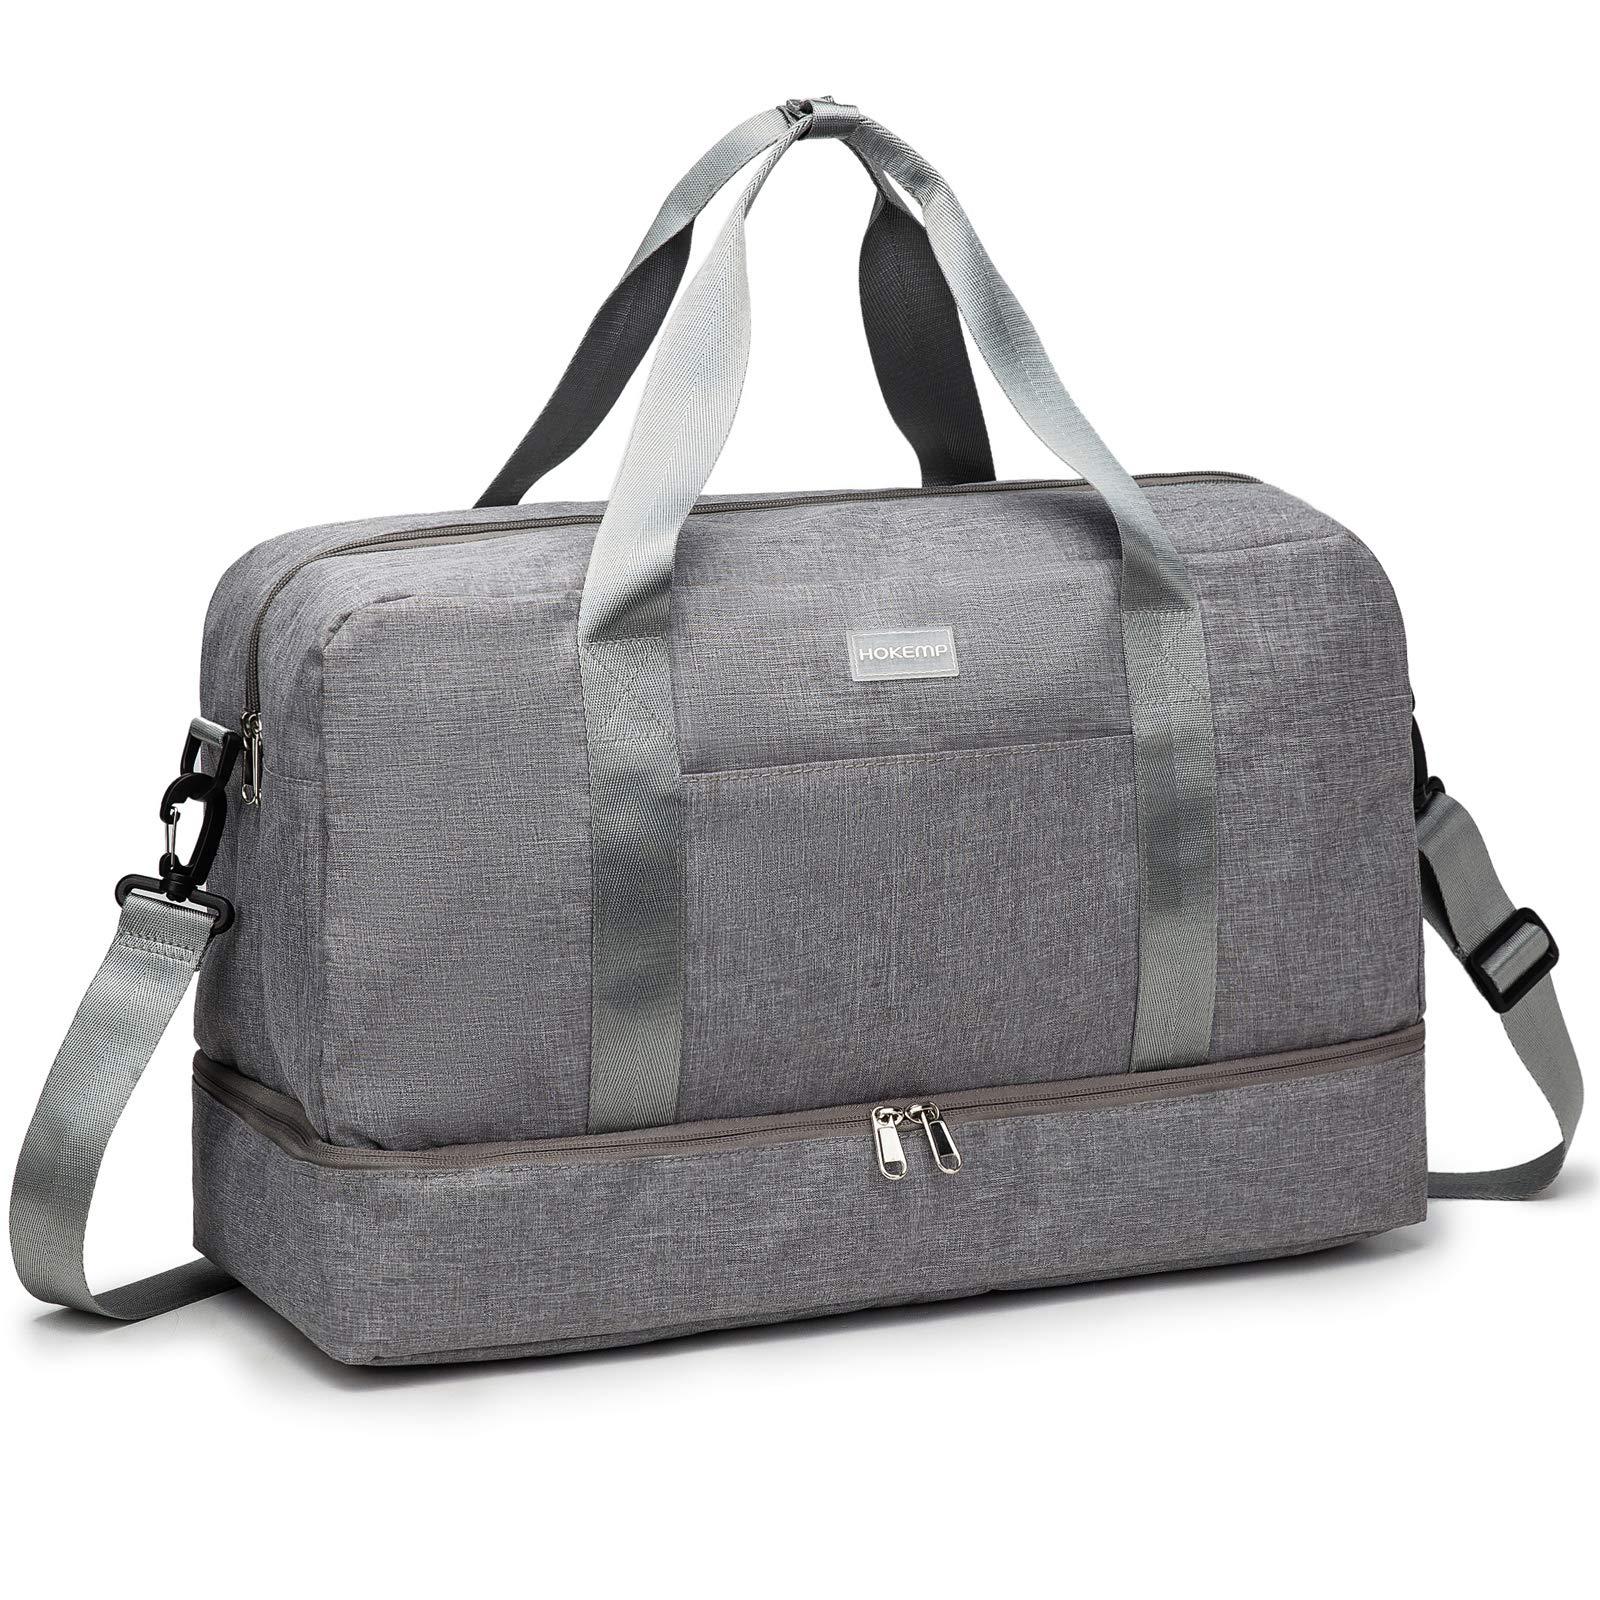 HOKEMP Sports Compartment Lightweight Luggage